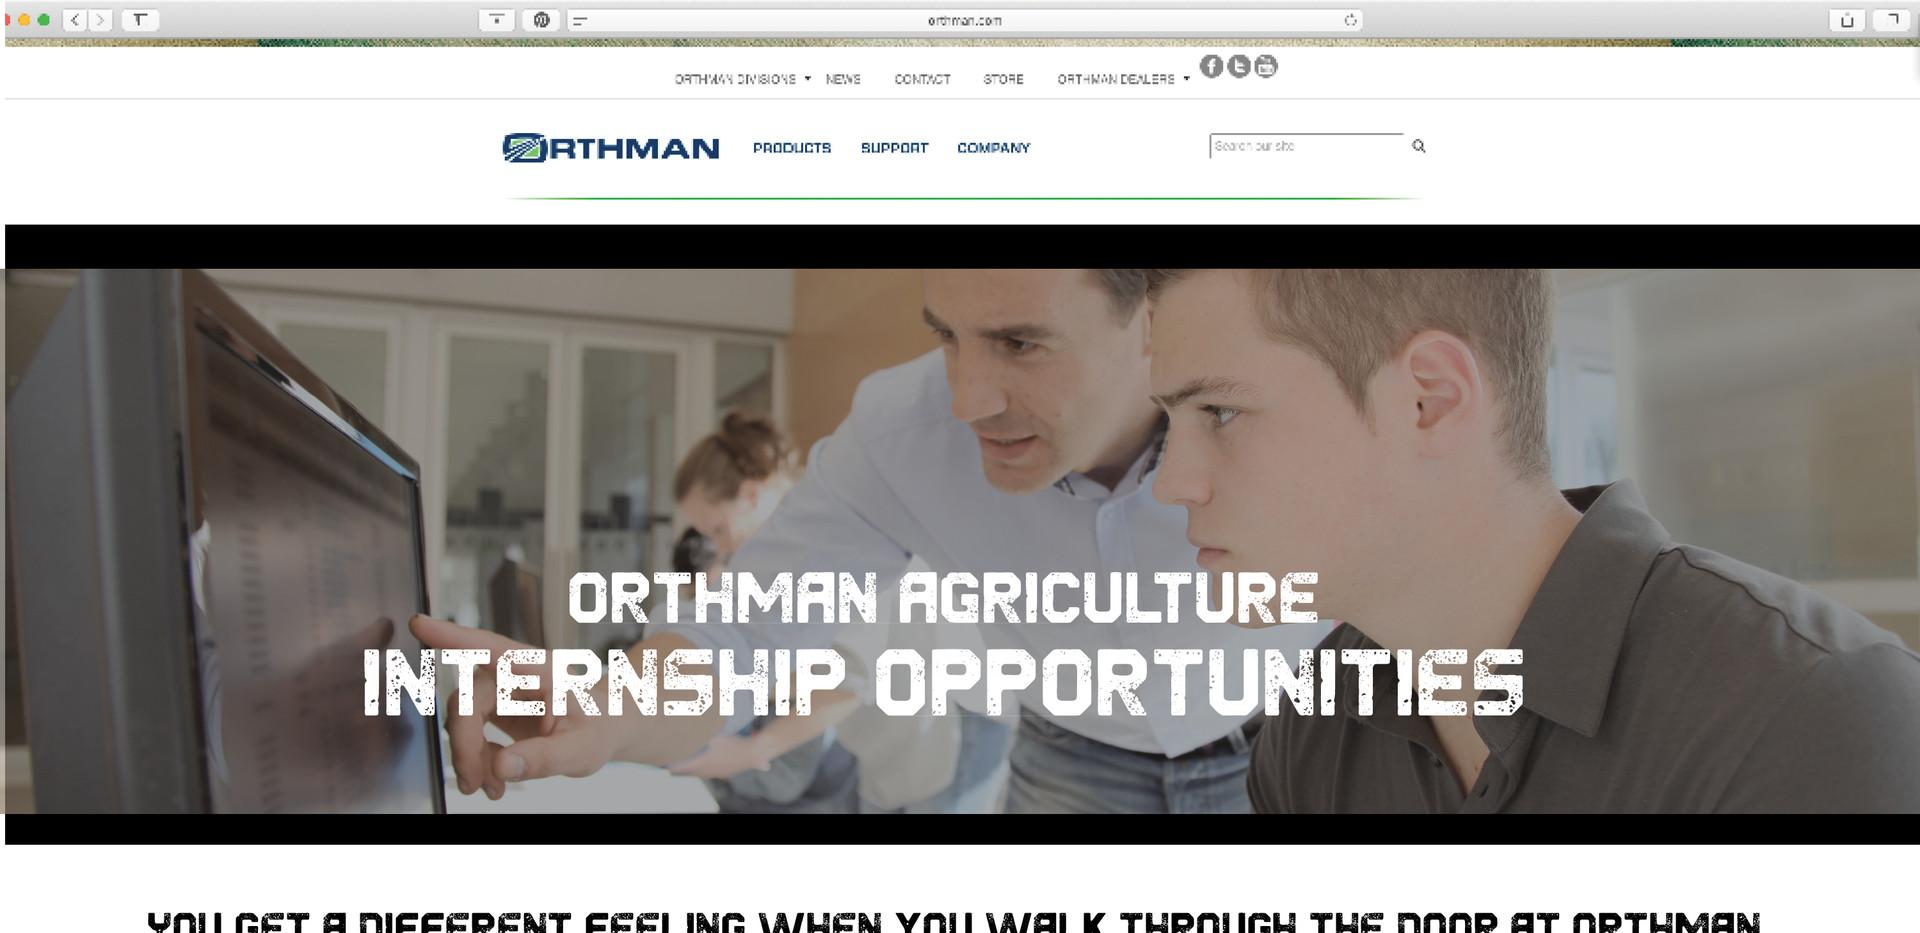 OMI_Careers_Internship.jpg